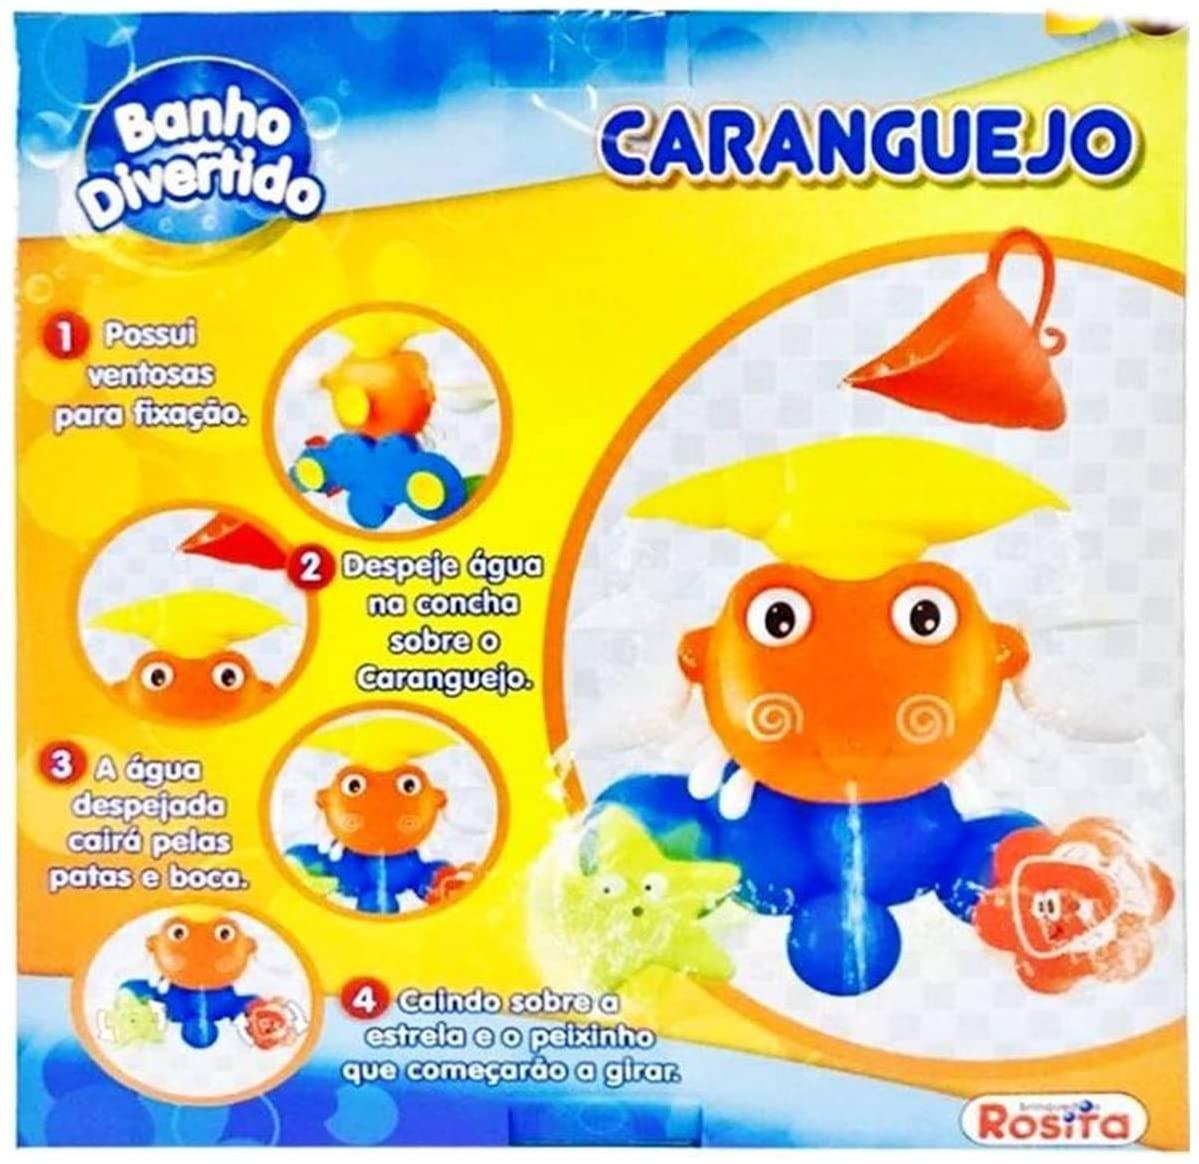 Carangueijo Banho Divertido 9851 ROSITA